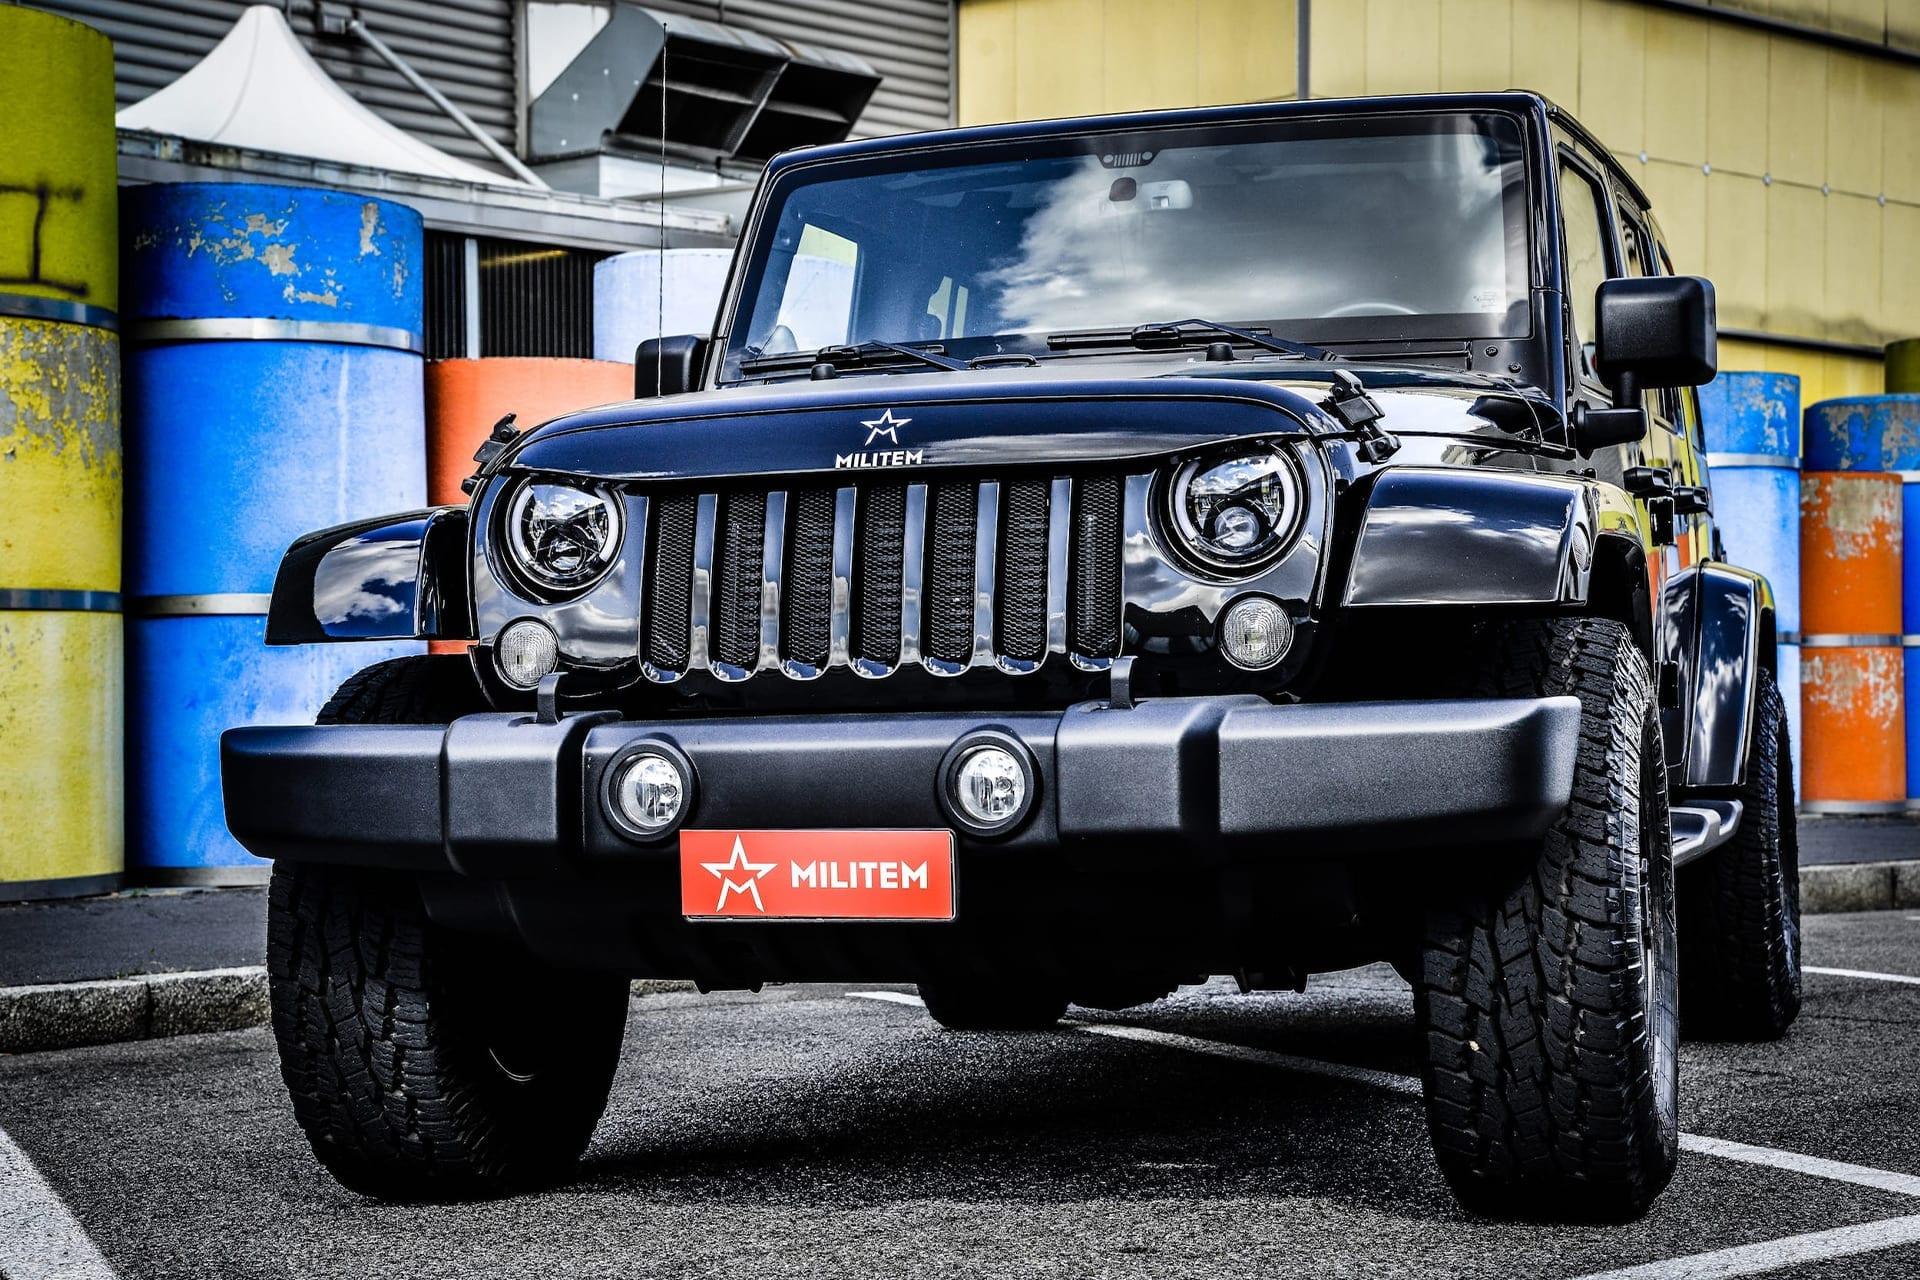 jeep americane 4x4 militem